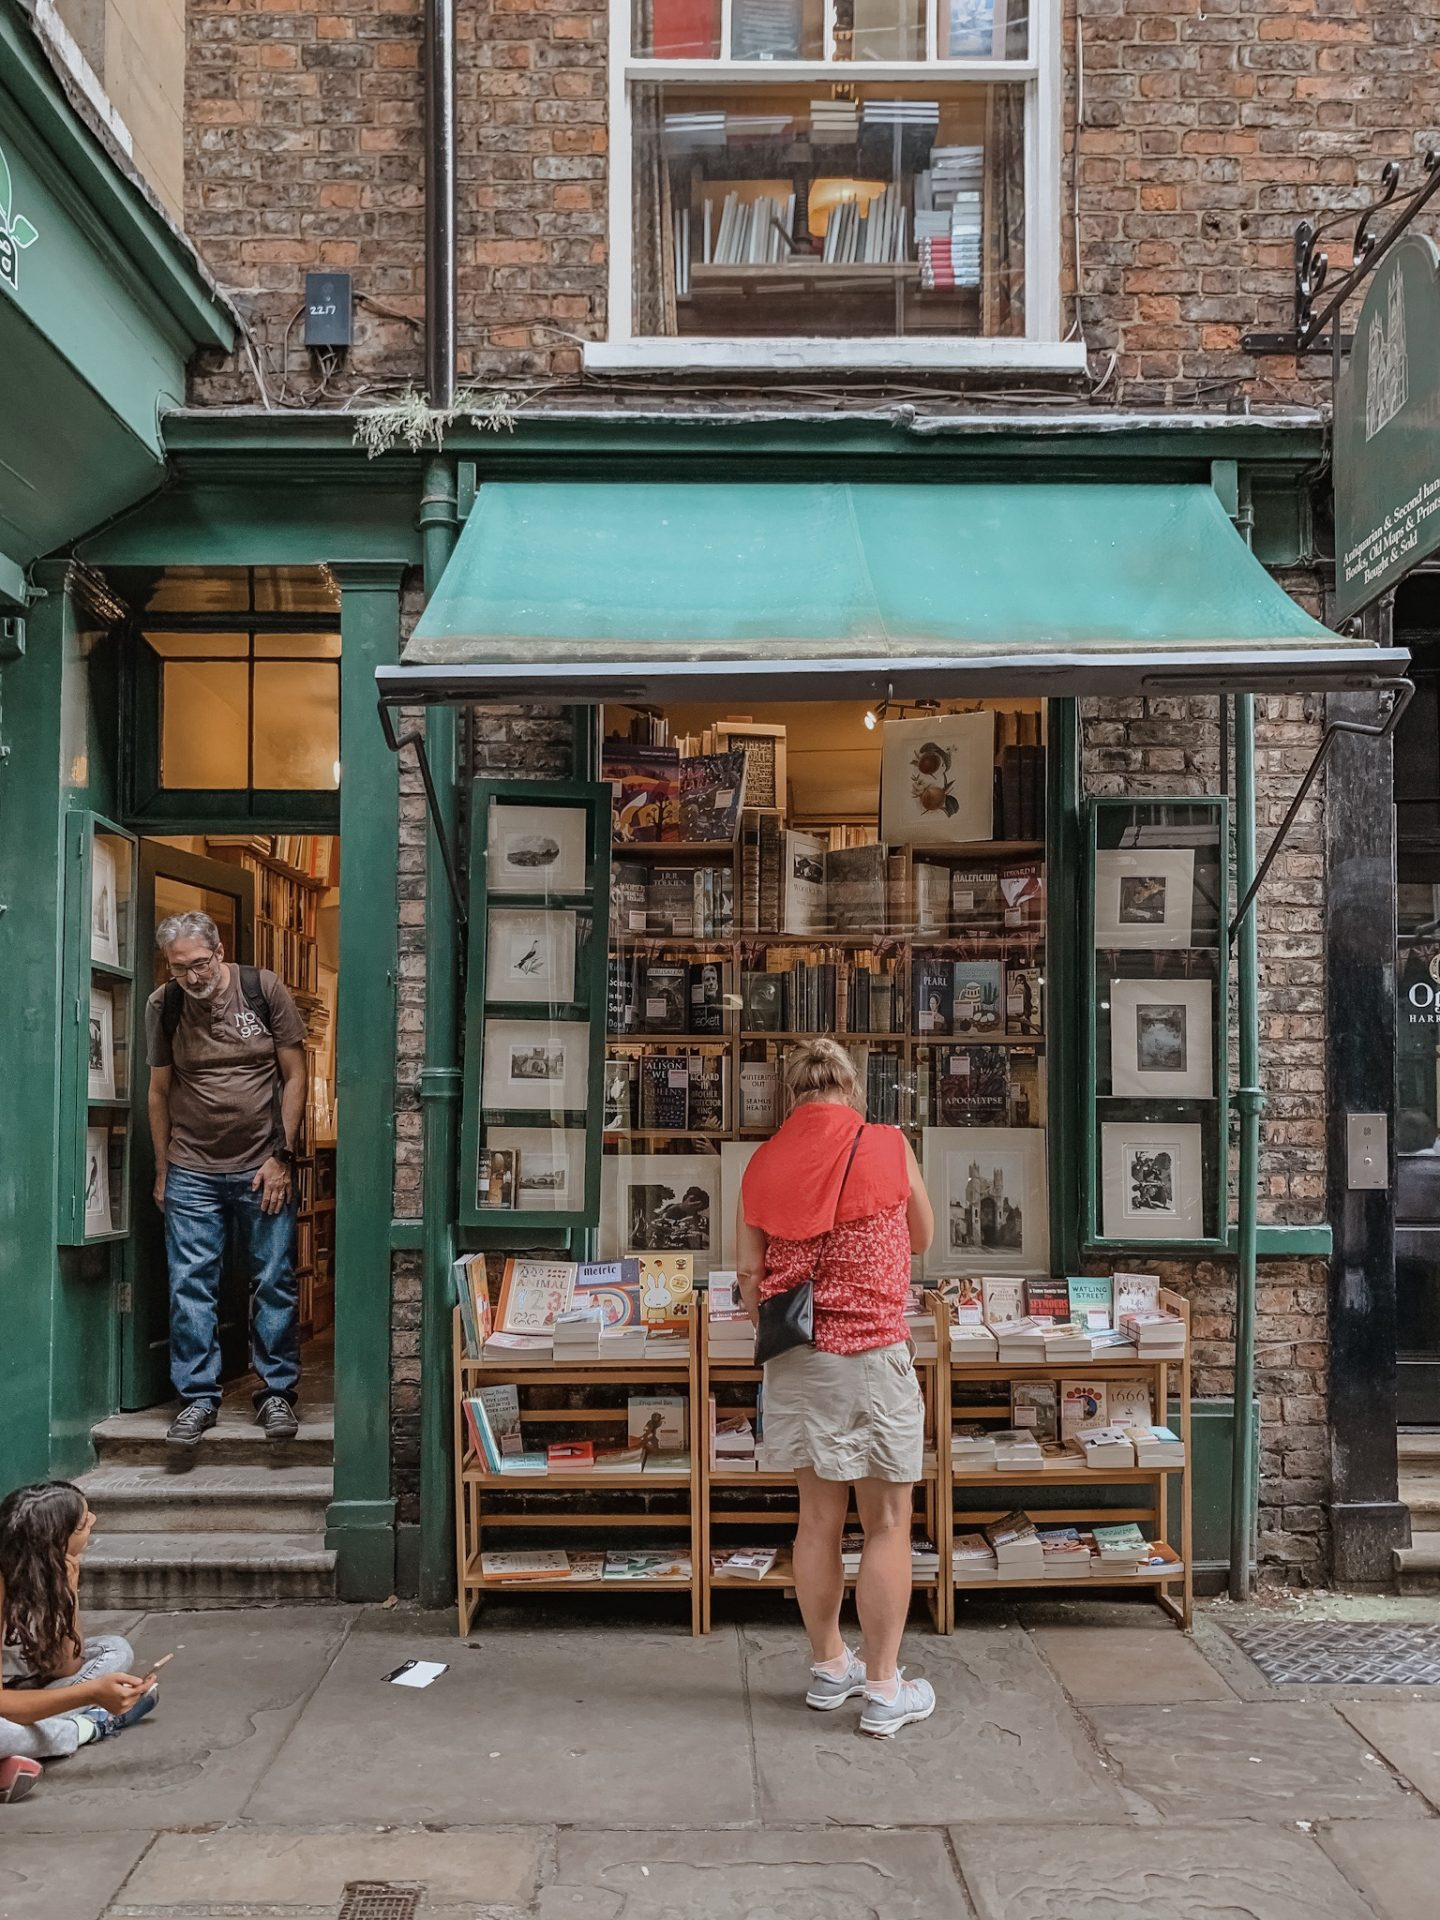 York, Streets of York, Tourism,